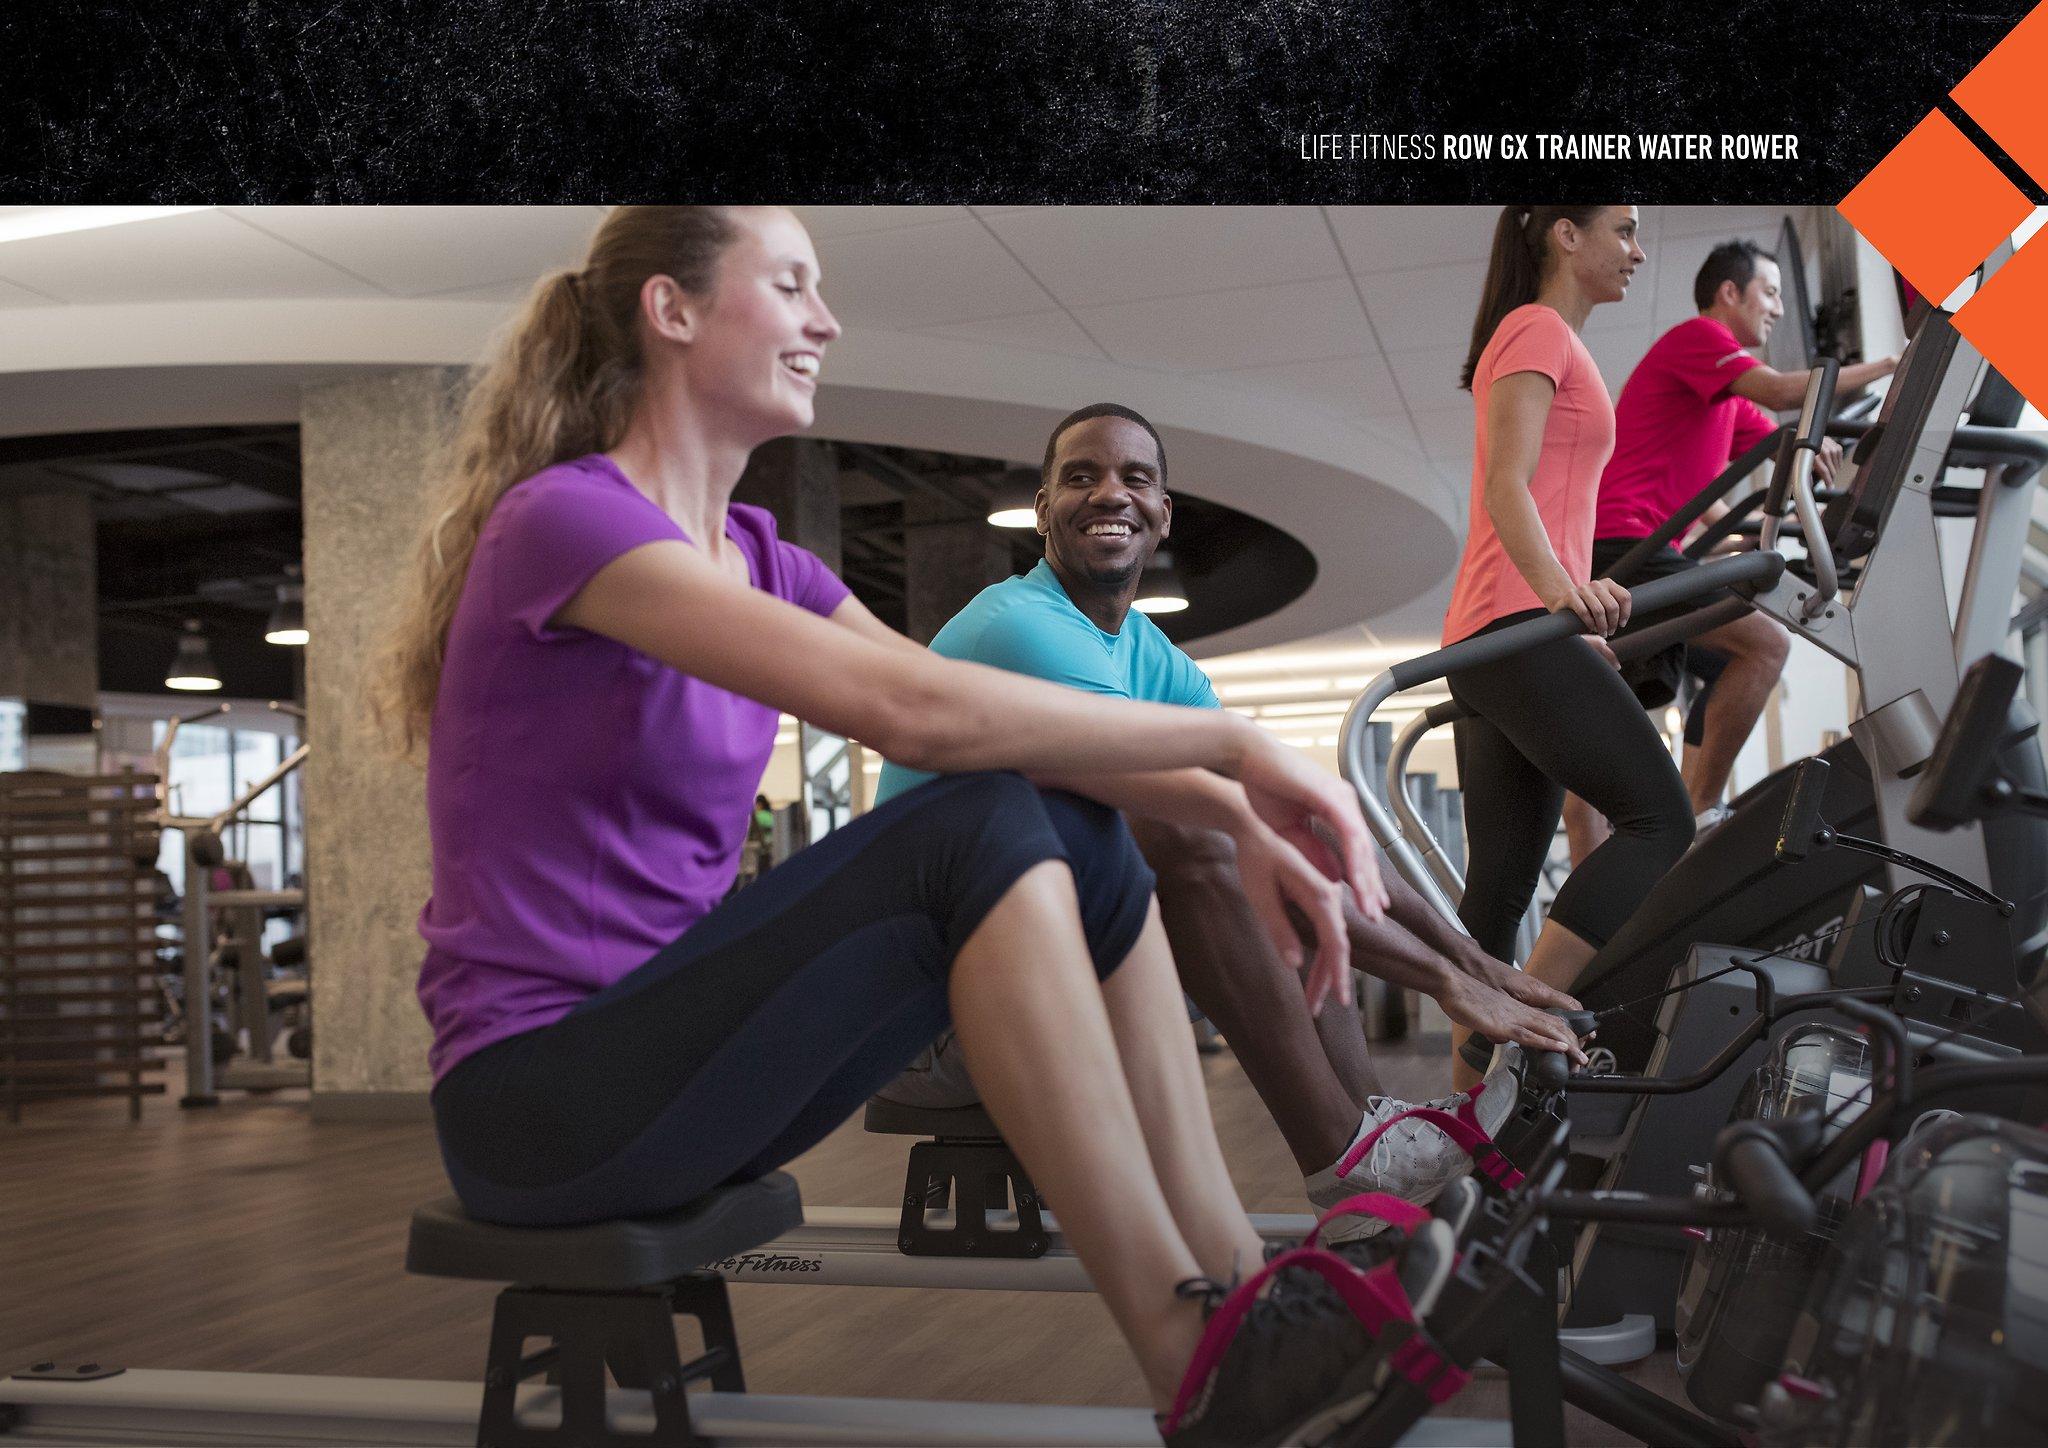 Row GX Trainer Water Rower – HIIT – MedicSport